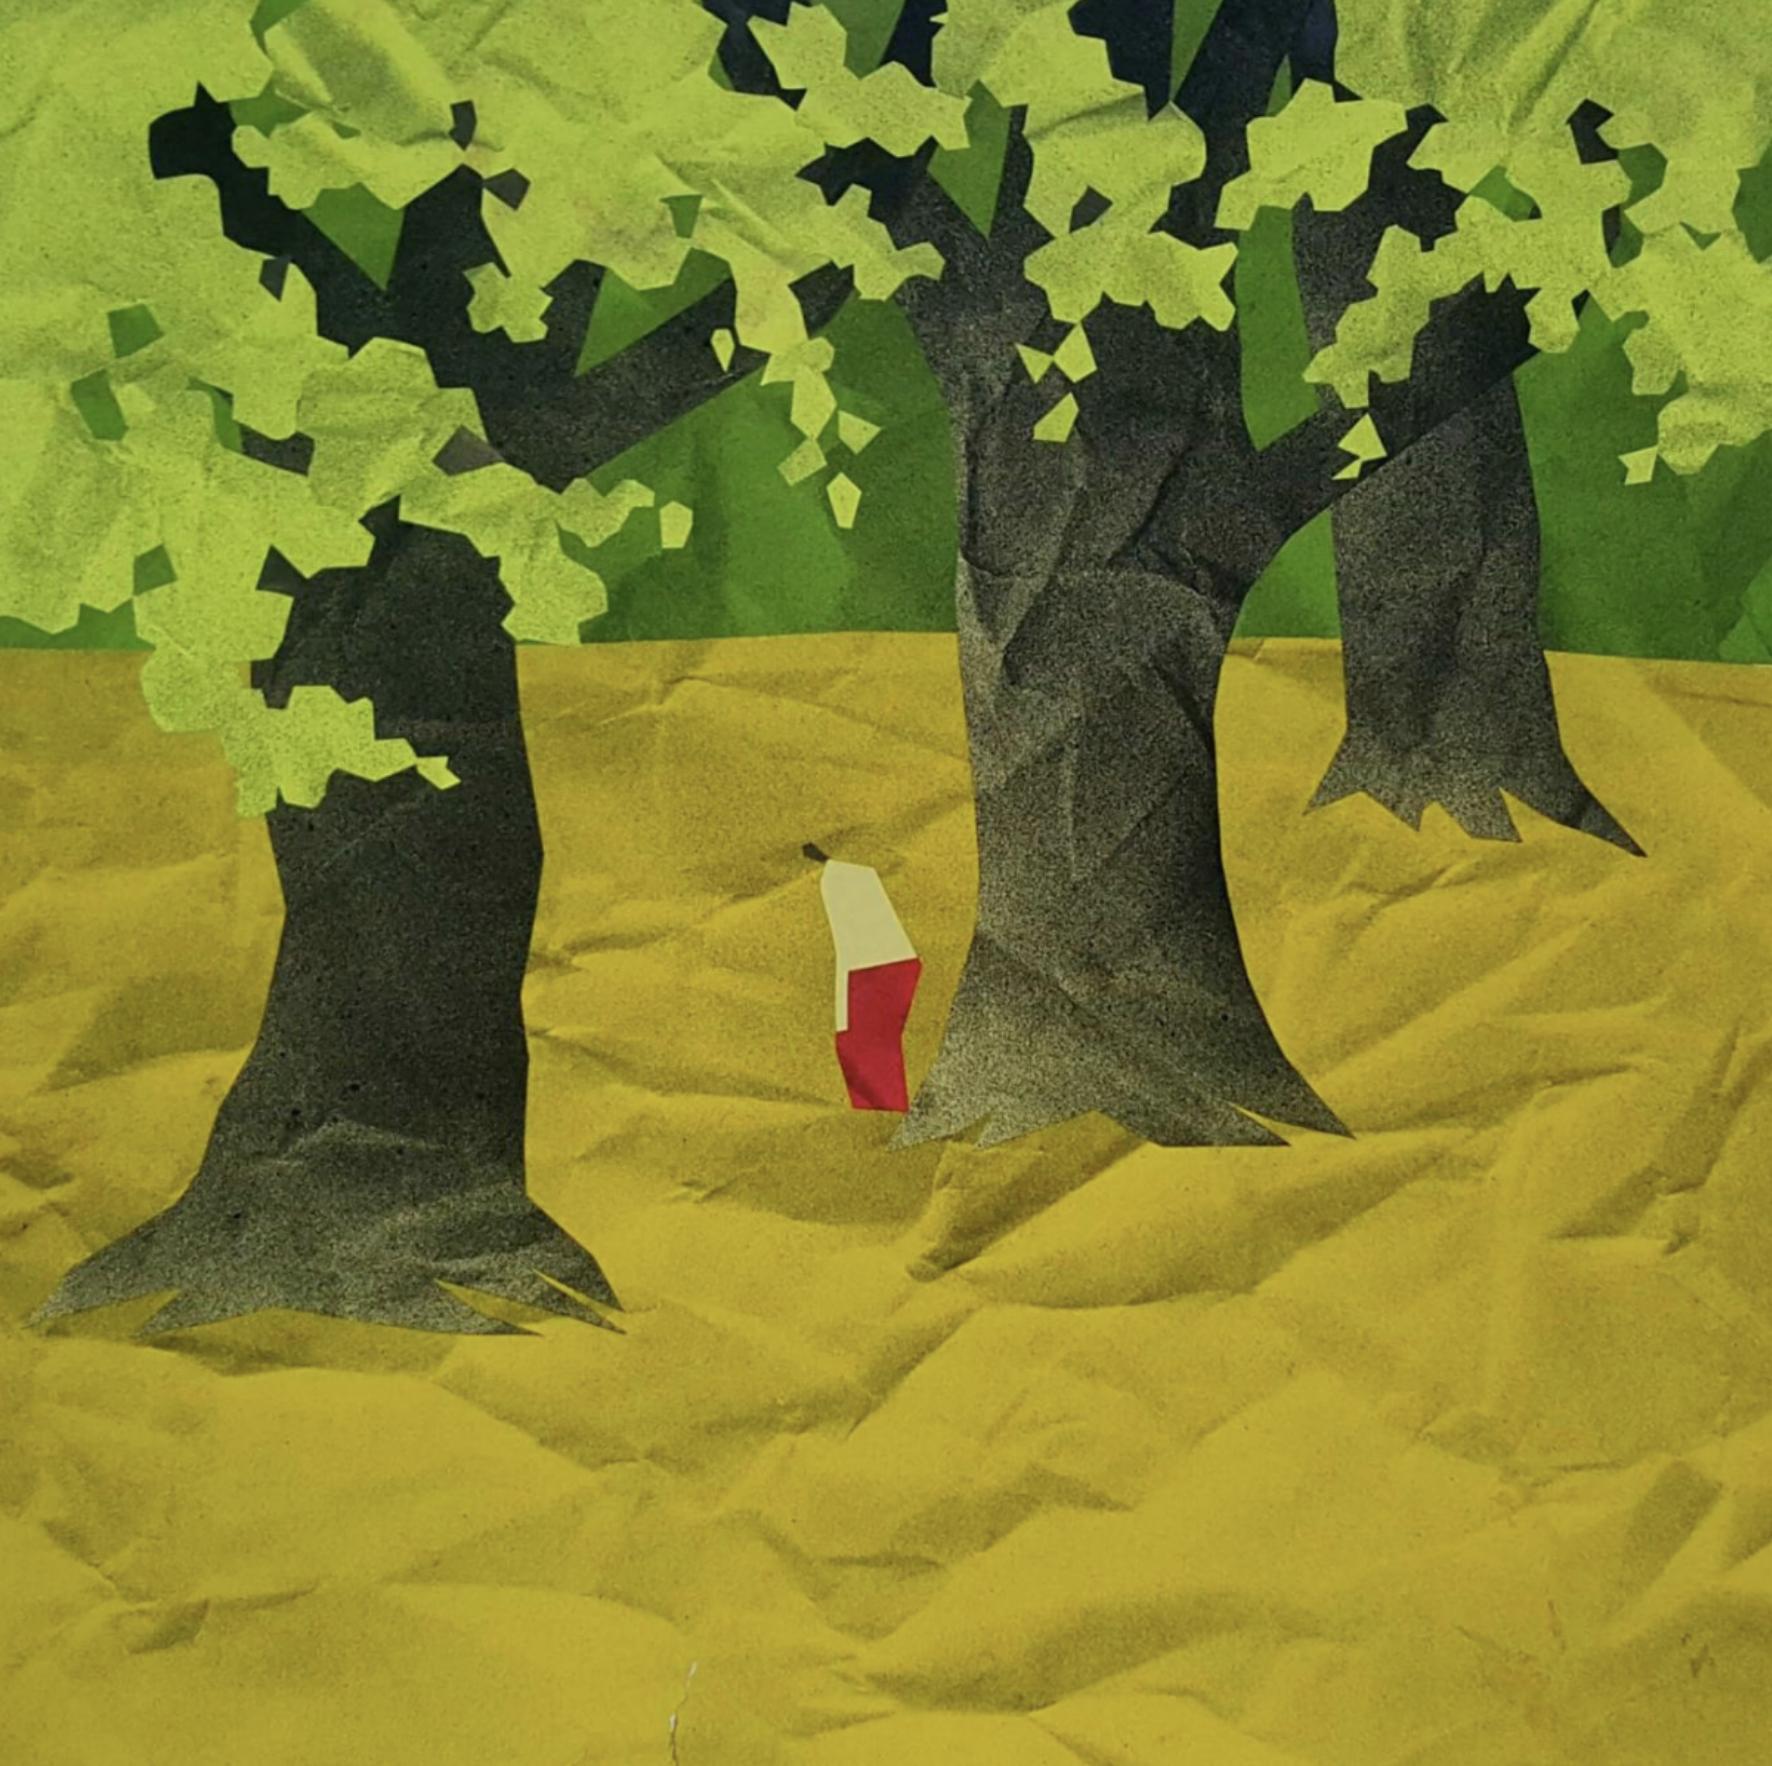 Min Zaw,  In the Garden , 2017, Acrylic Paper Collage, 38 x 38 cm. Courtesy of the artist & Art Seasons